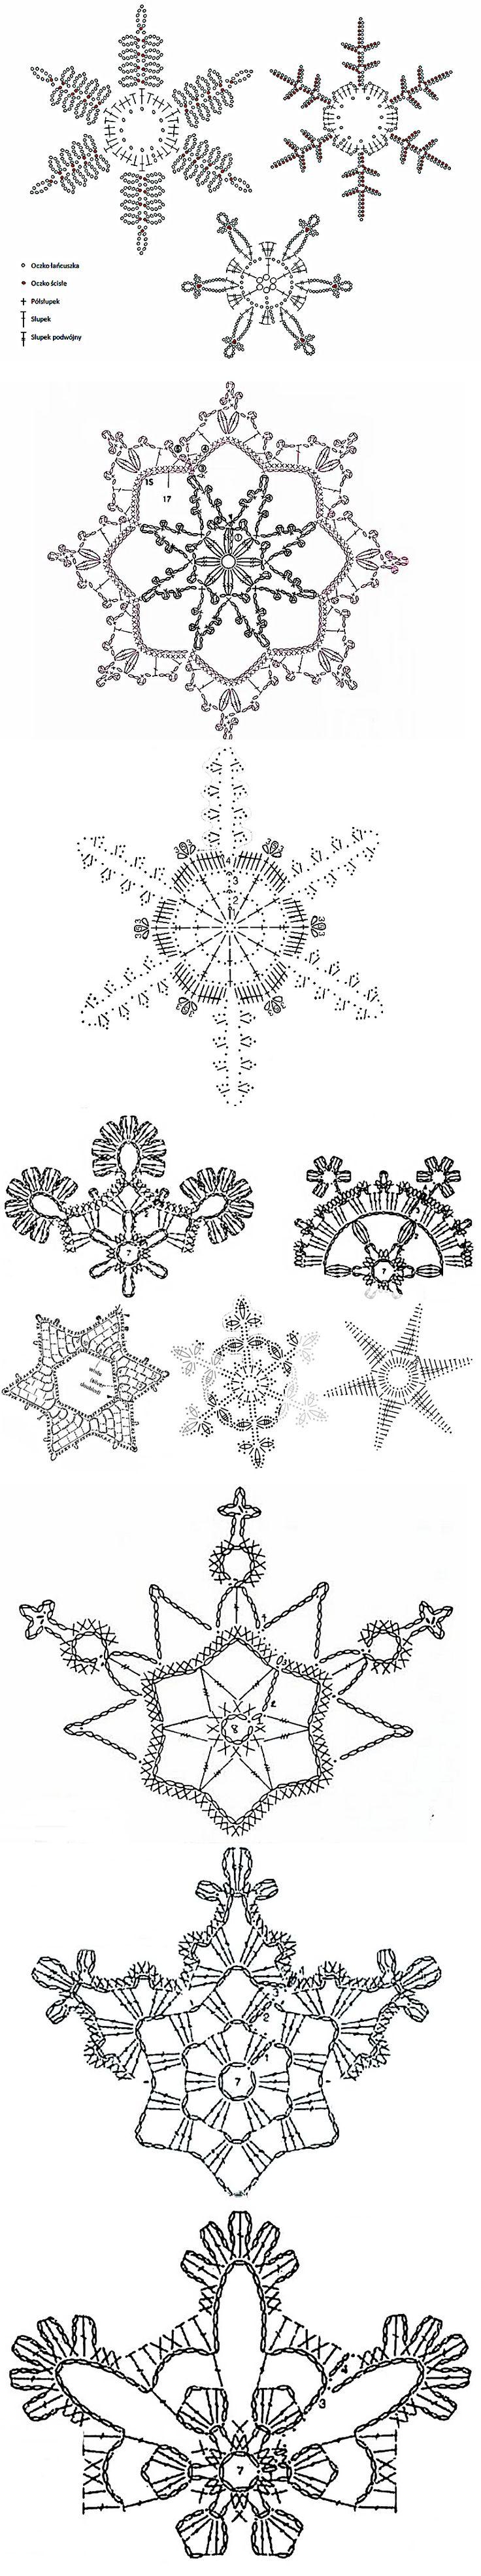 37 mejores imágenes sobre crochet navidad en Pinterest | Navidad ...